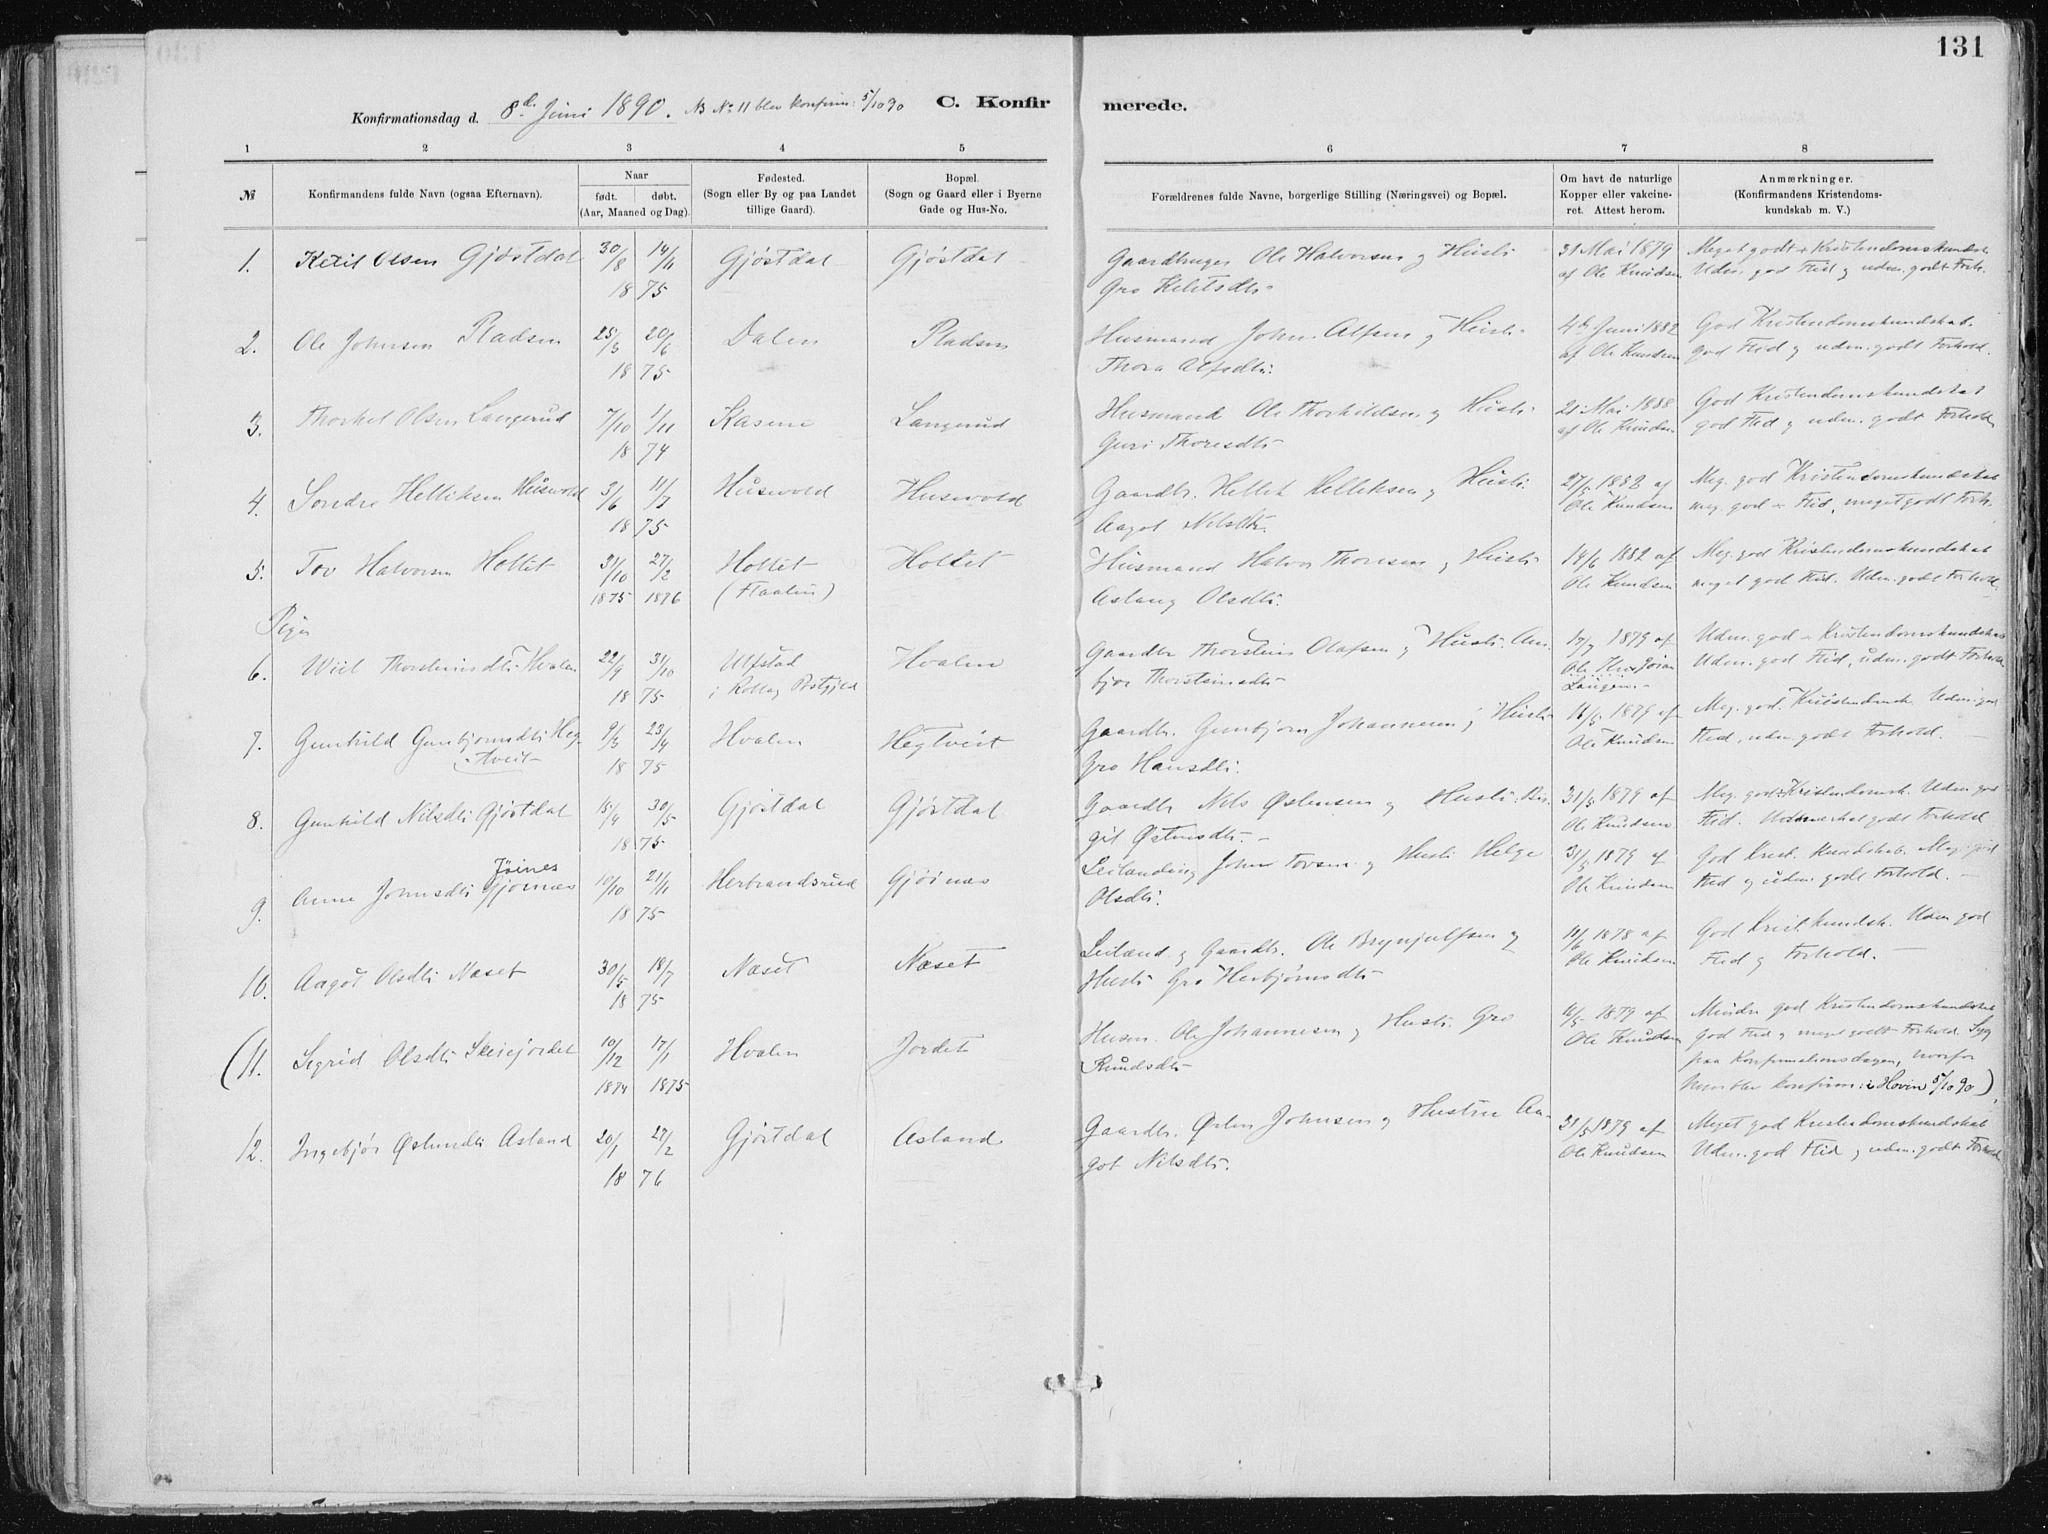 SAKO, Tinn kirkebøker, F/Fa/L0007: Ministerialbok nr. I 7, 1878-1922, s. 131